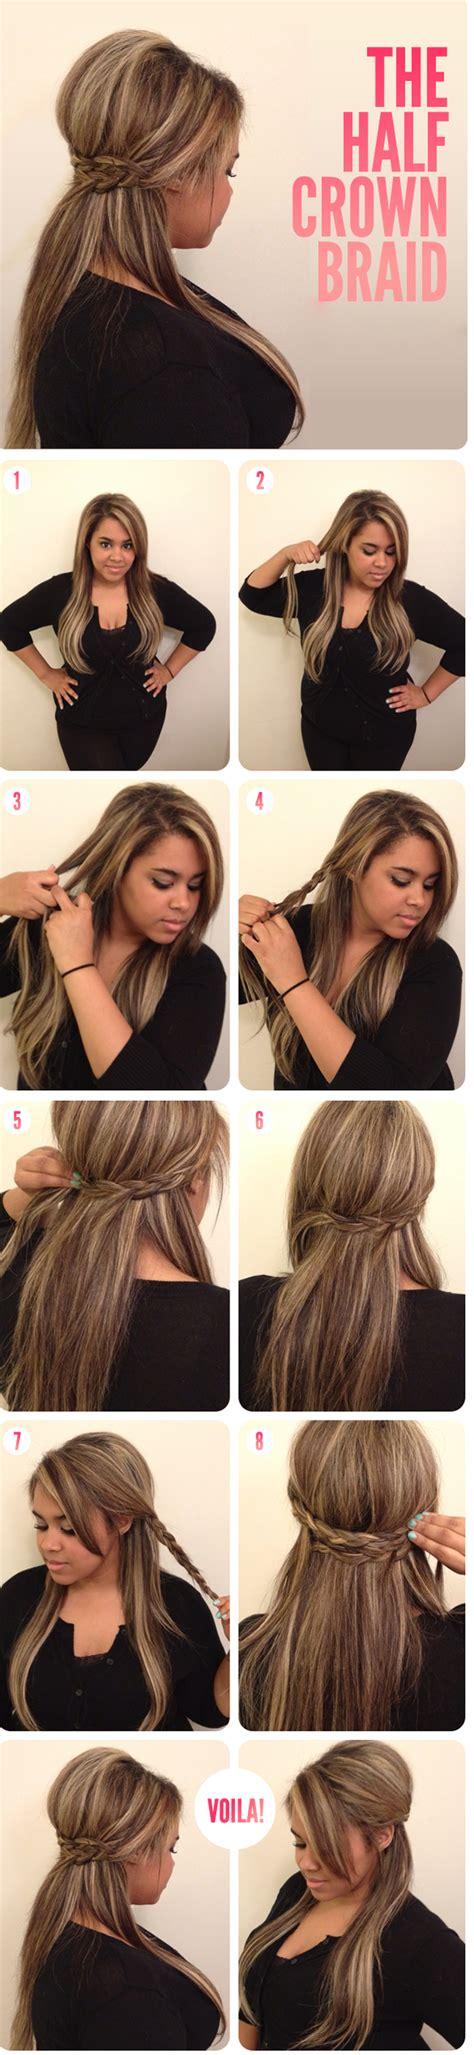 15 Easy and Pretty Braid Tutorials   Pretty Designs